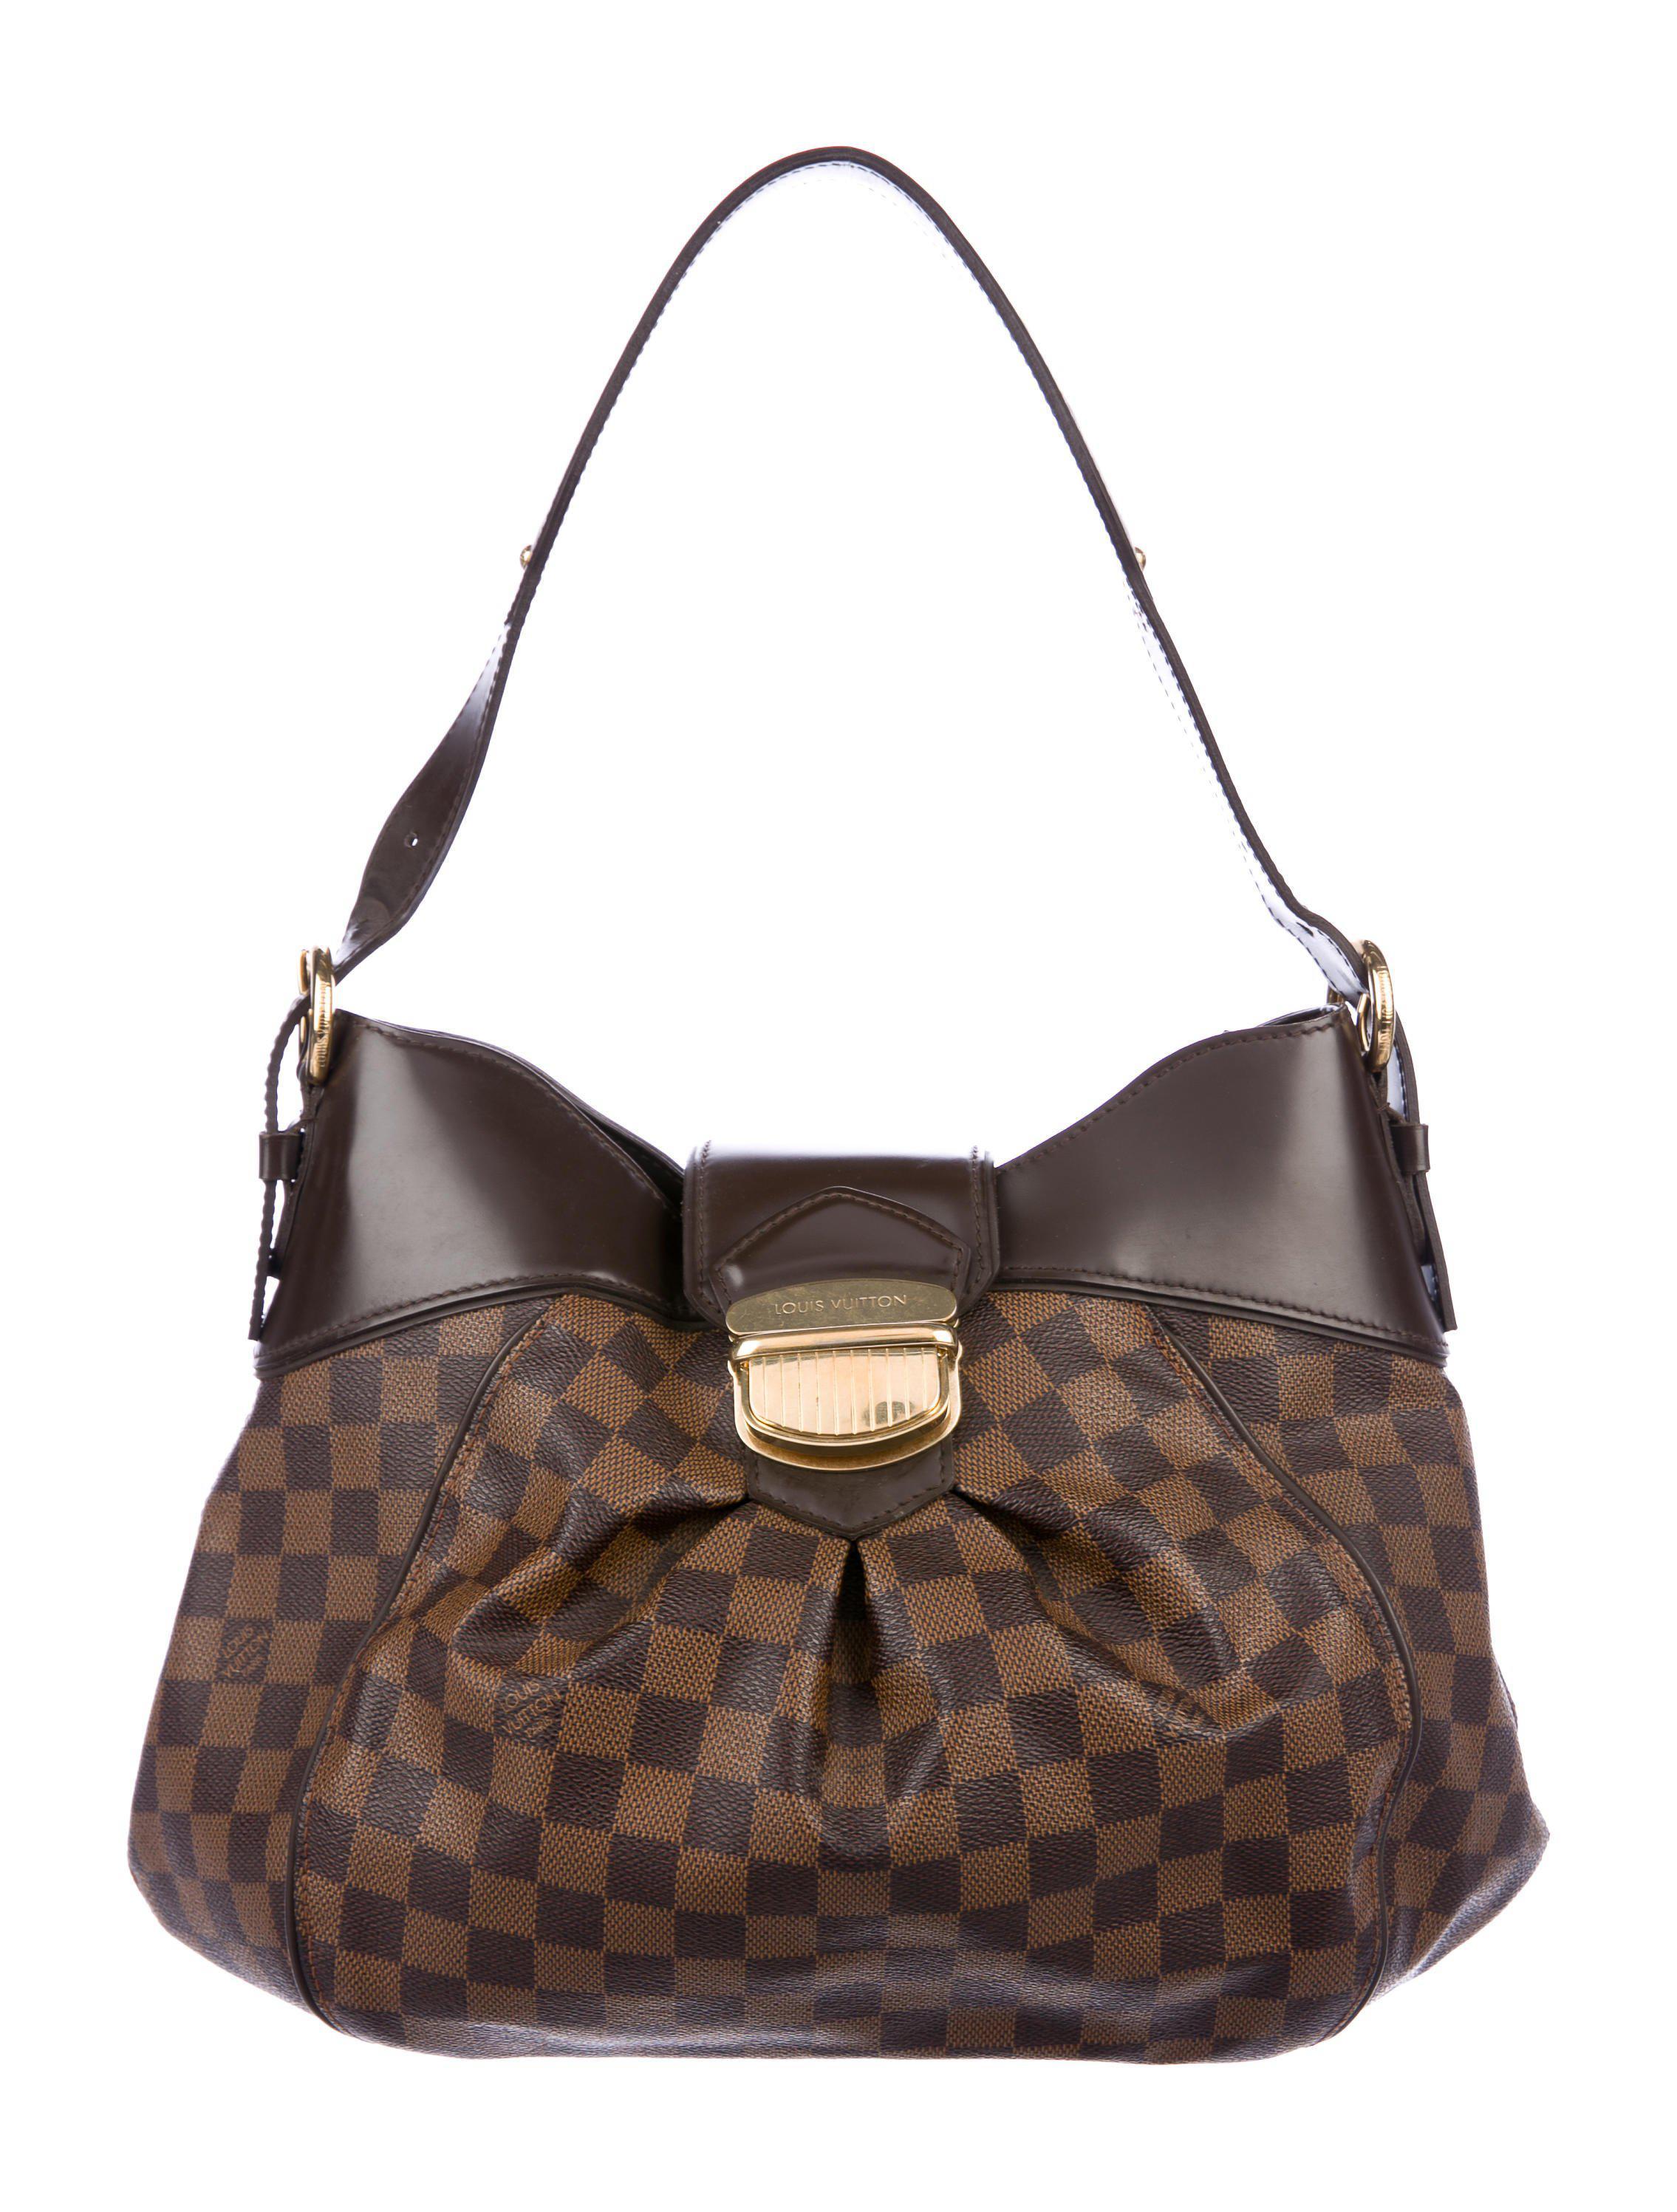 30f65e9cb217 Lyst - Louis Vuitton Damier Ebene Sistina Mm Brown in Natural